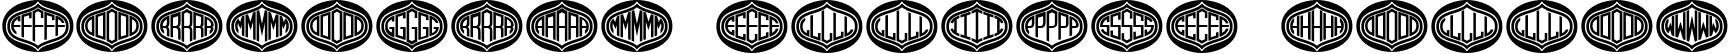 Formogram Ellipse Hollow